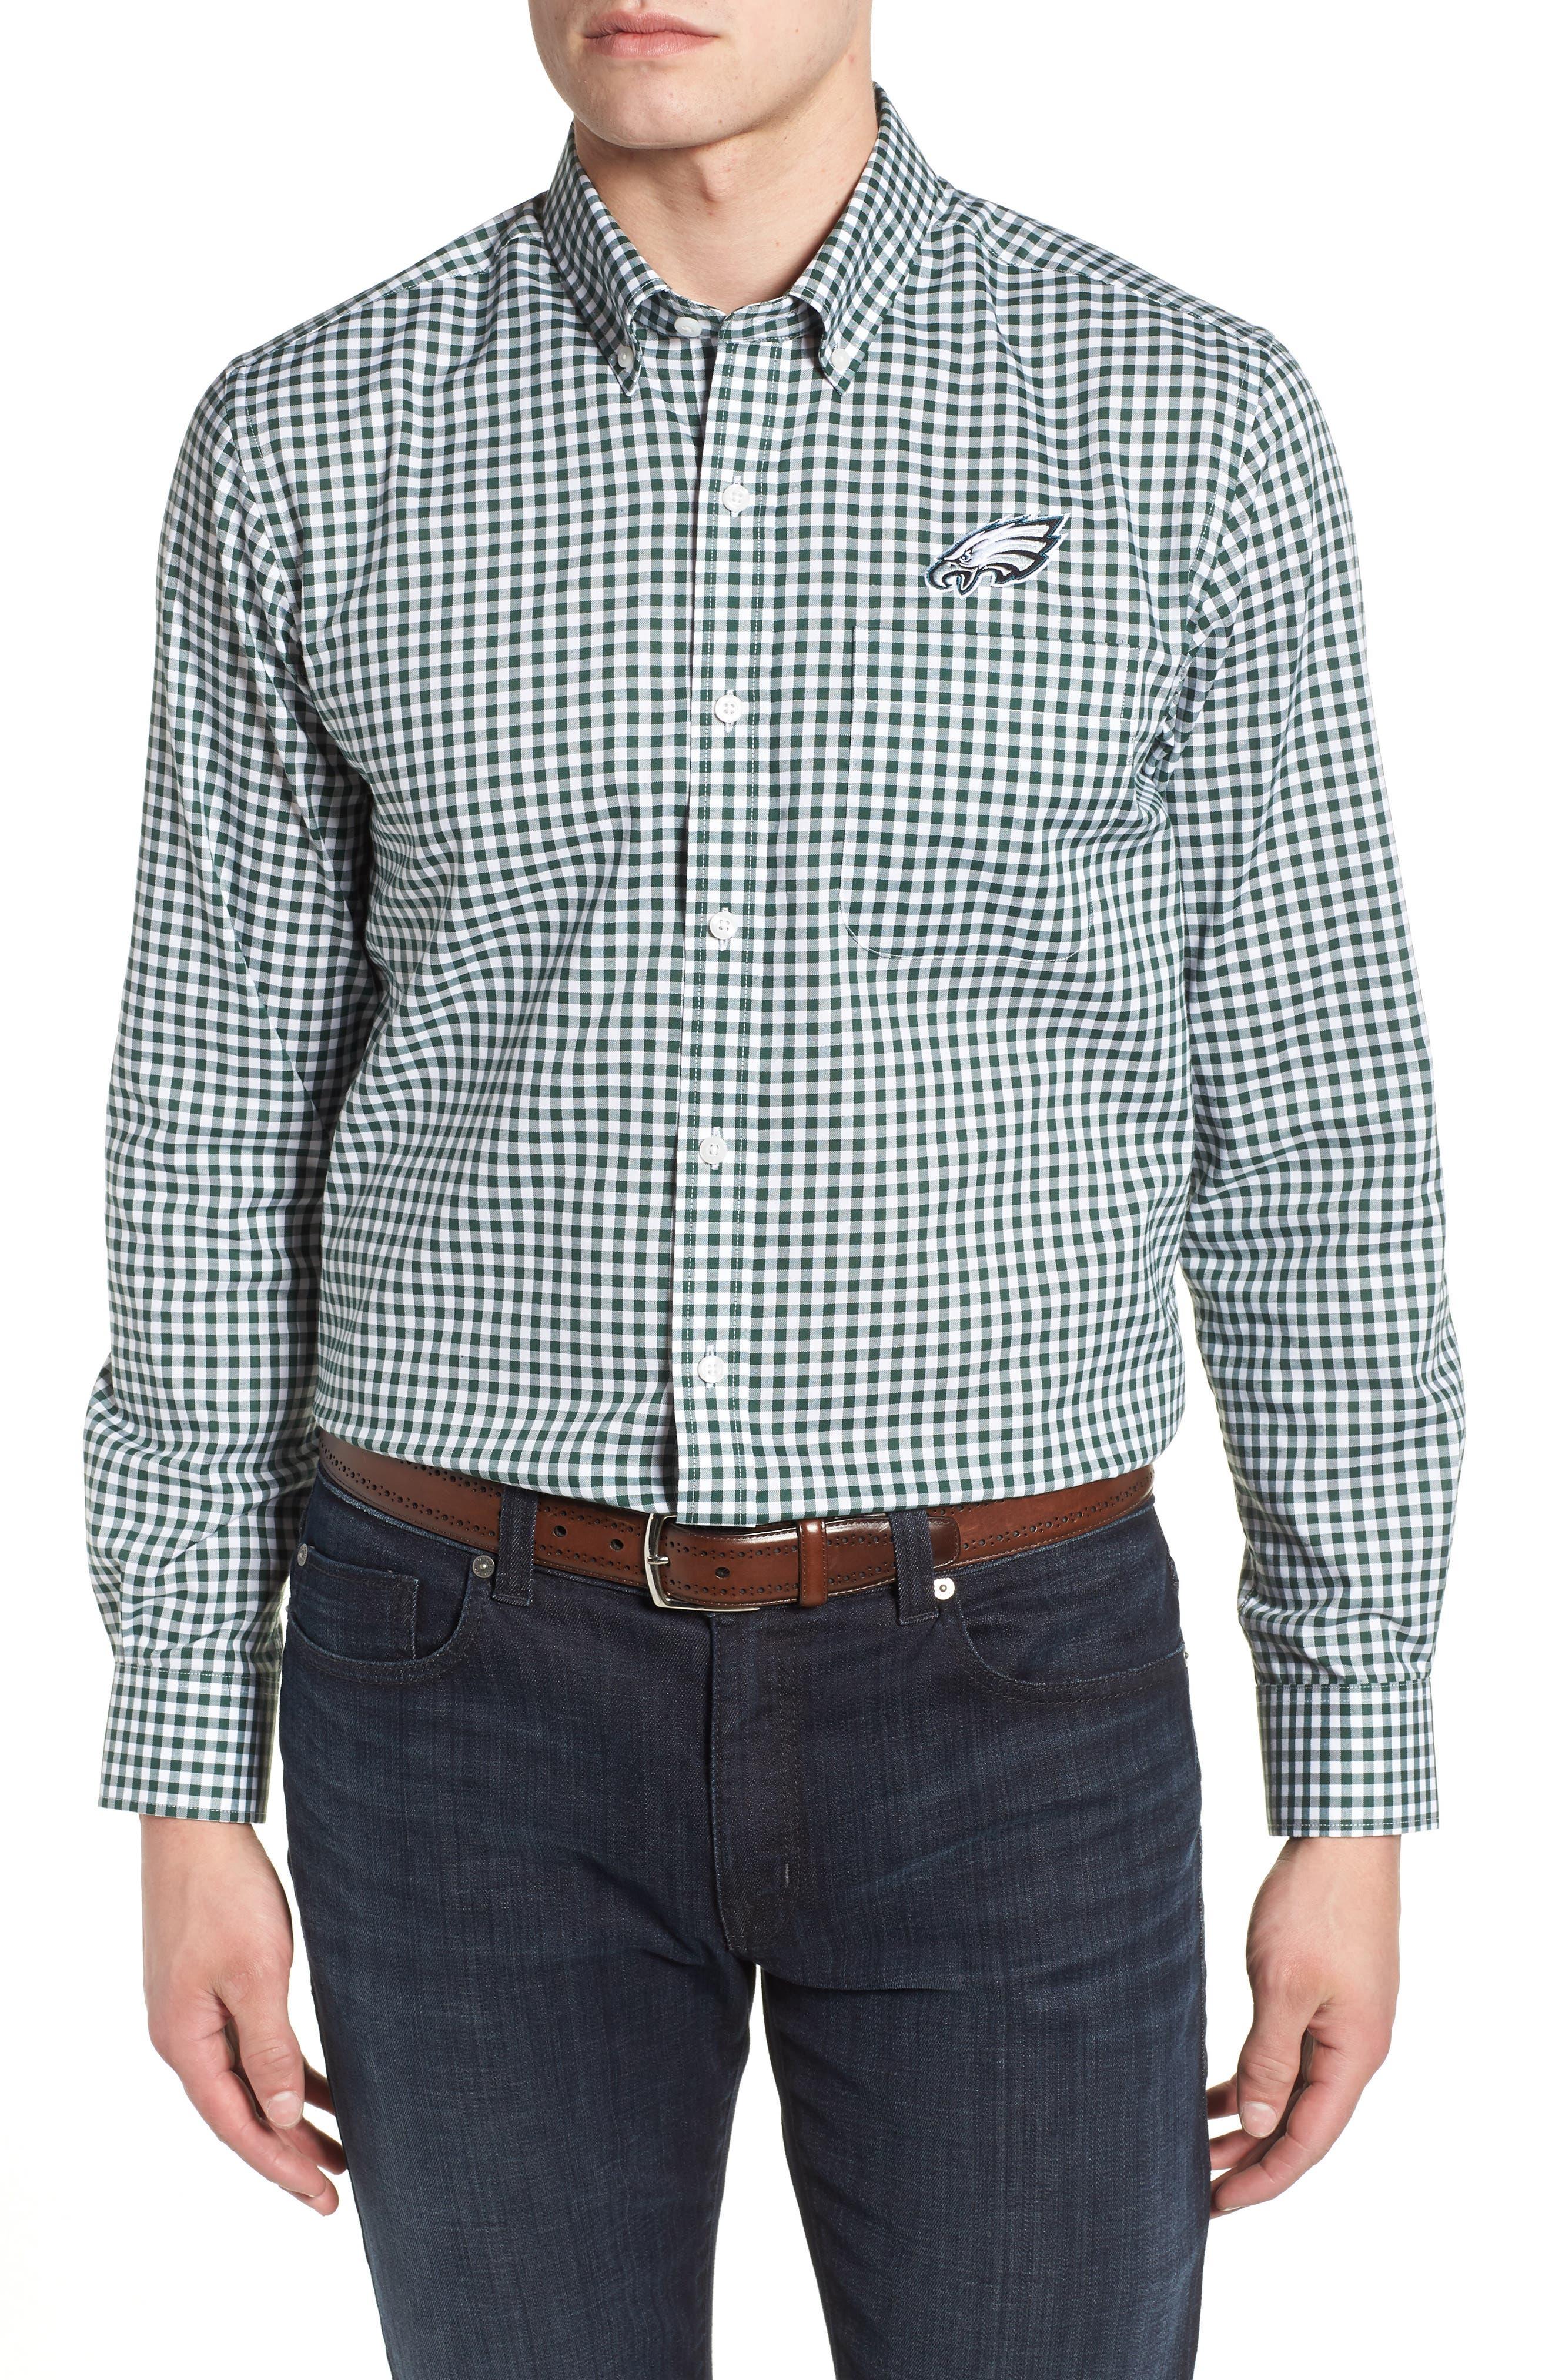 League Philadelphia Eagles Regular Fit Shirt,                         Main,                         color, 377